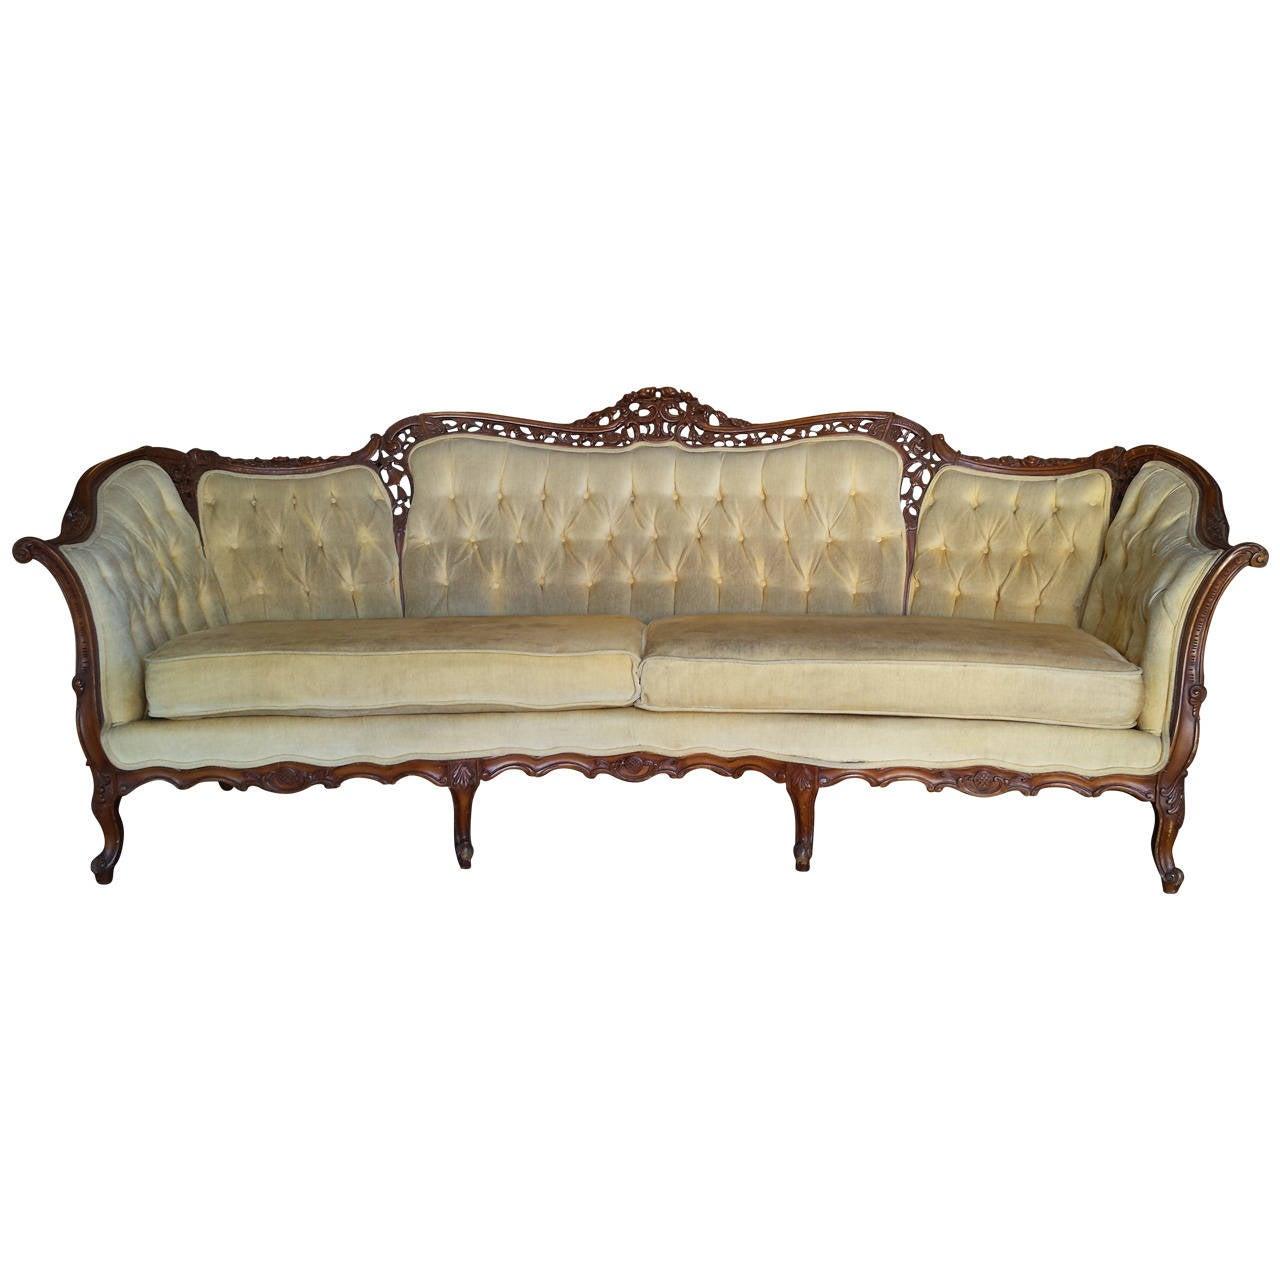 French Sofa French Louis XV Style FullSize Tufted Sofa